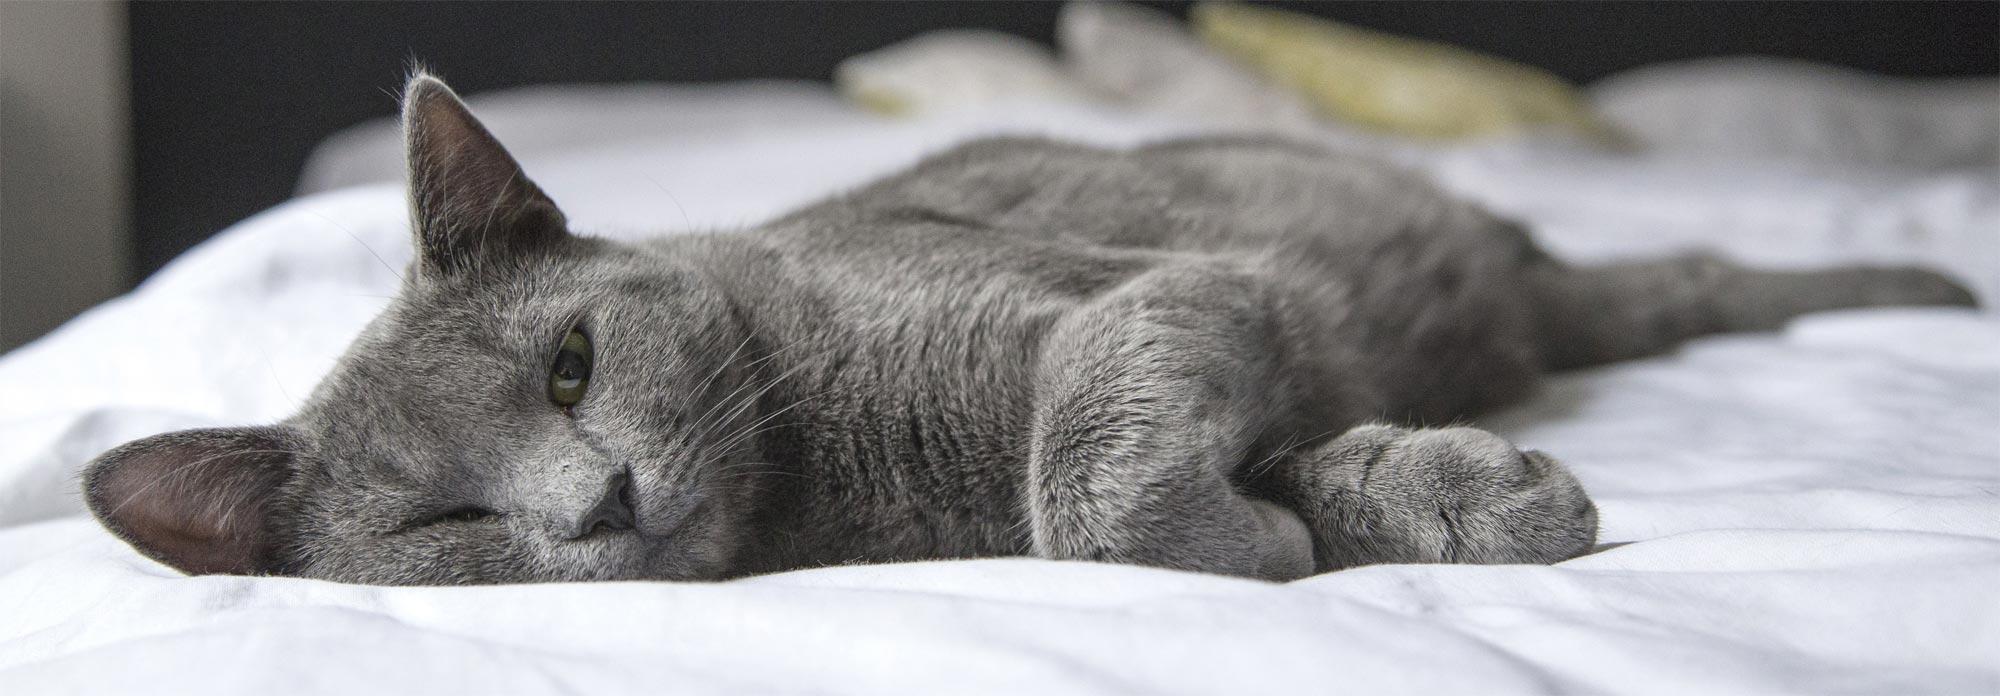 Kategoriebild Bettwaren